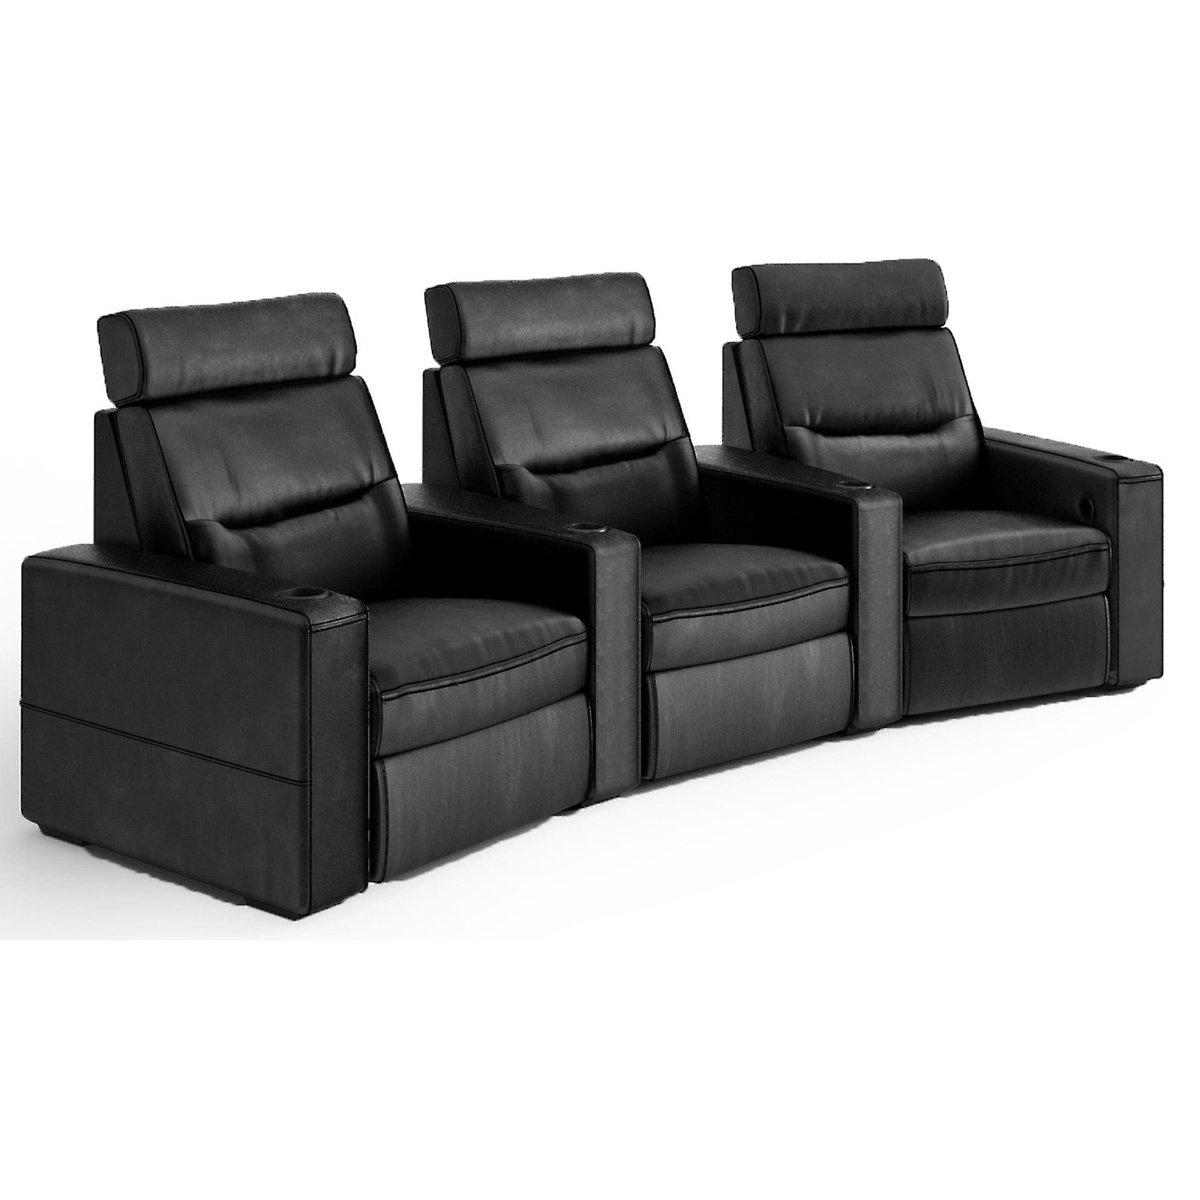 Salamander TC3 AV Basics 3-Seat Wedge Motorized Recliner Home Theater Seating (Black Bonded Leather)